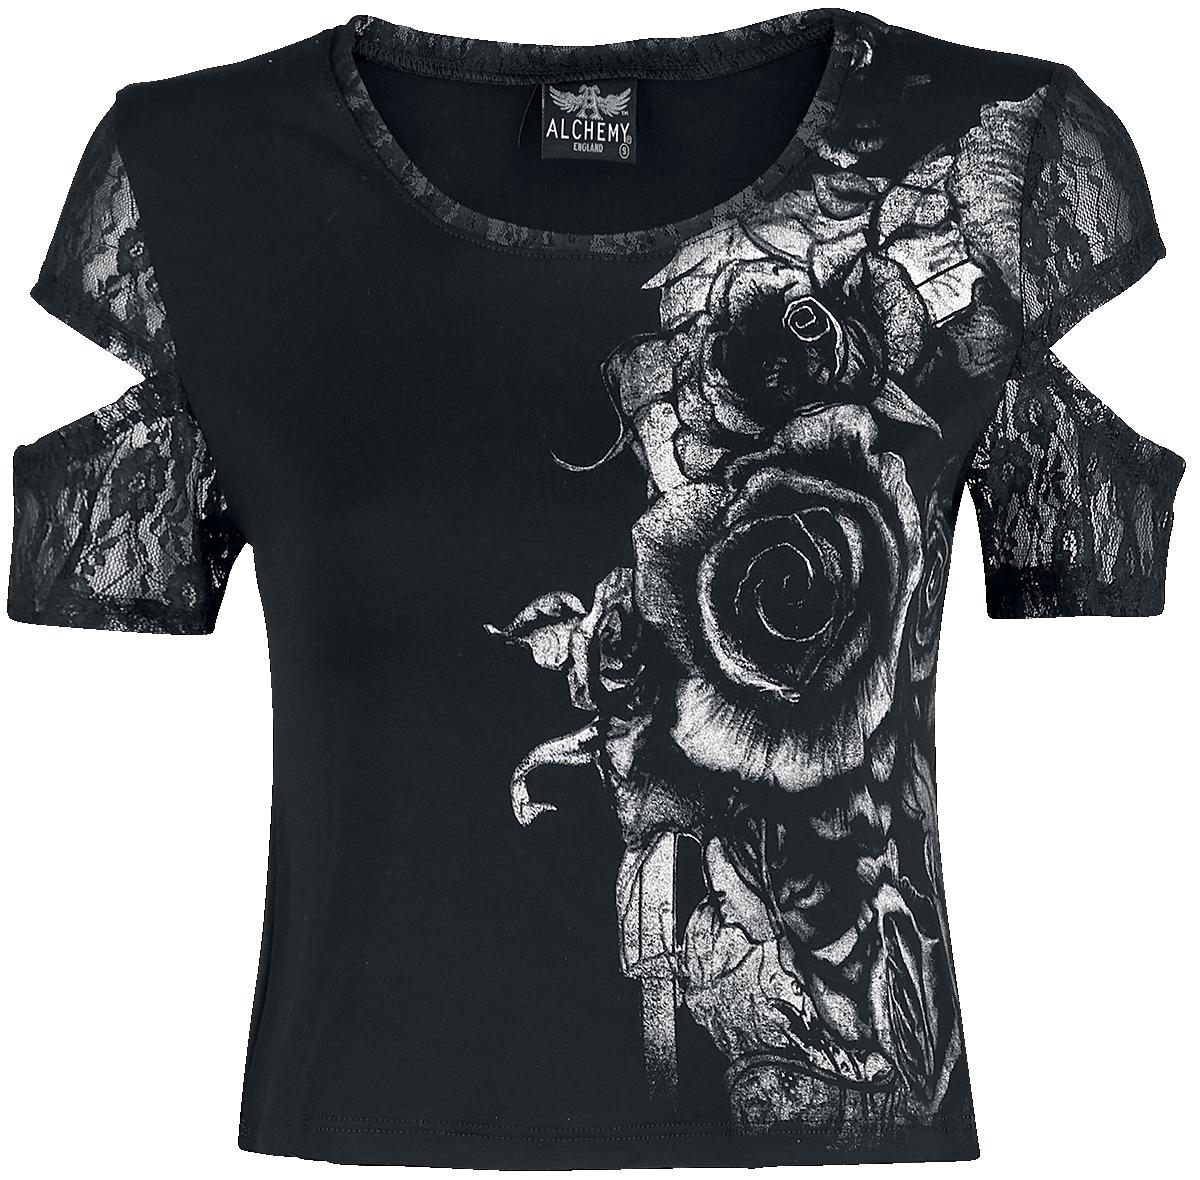 Alchemy England - Dame's Roses - Girls shirt - black image